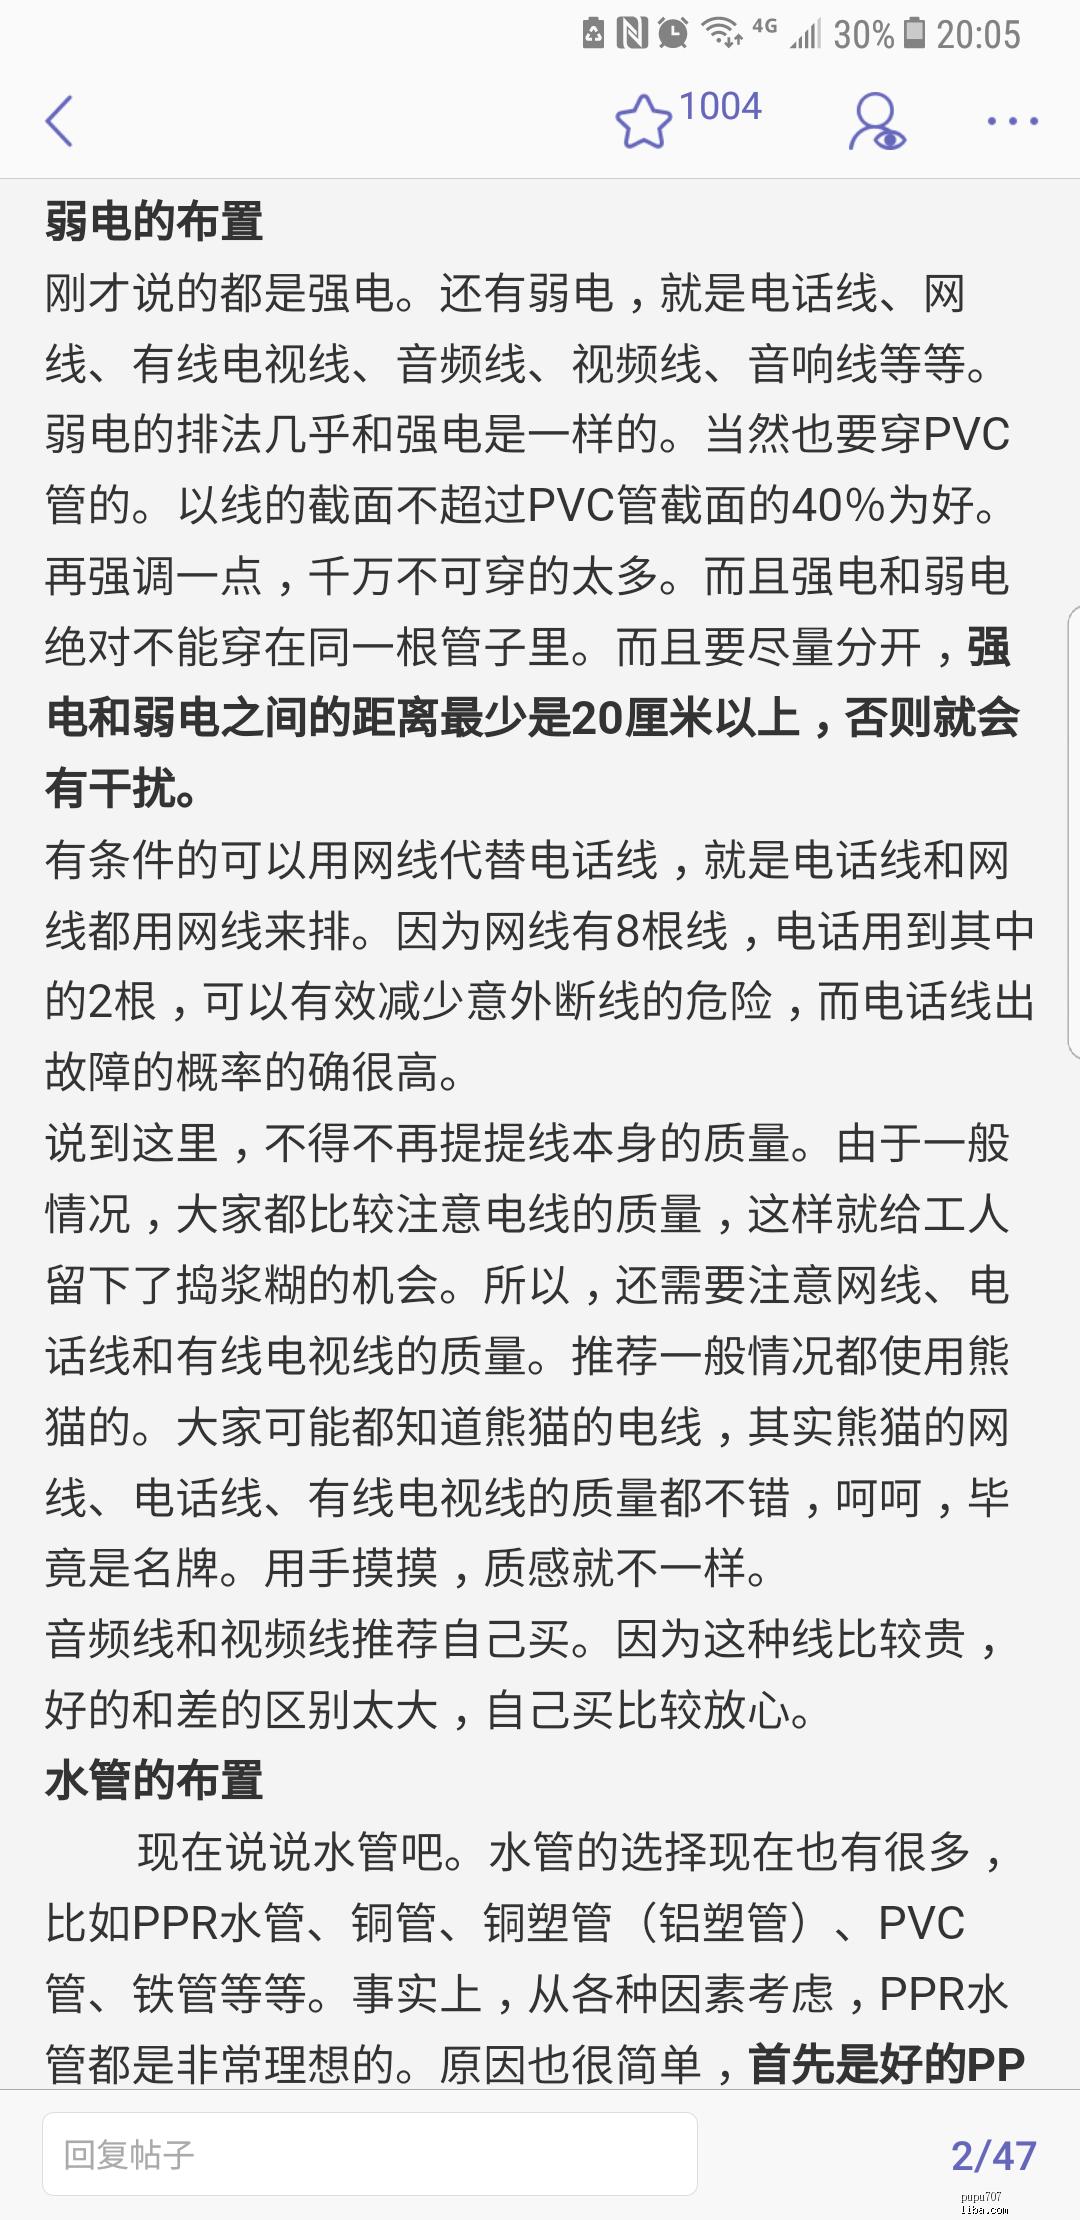 Screenshot_20180413-200522.png